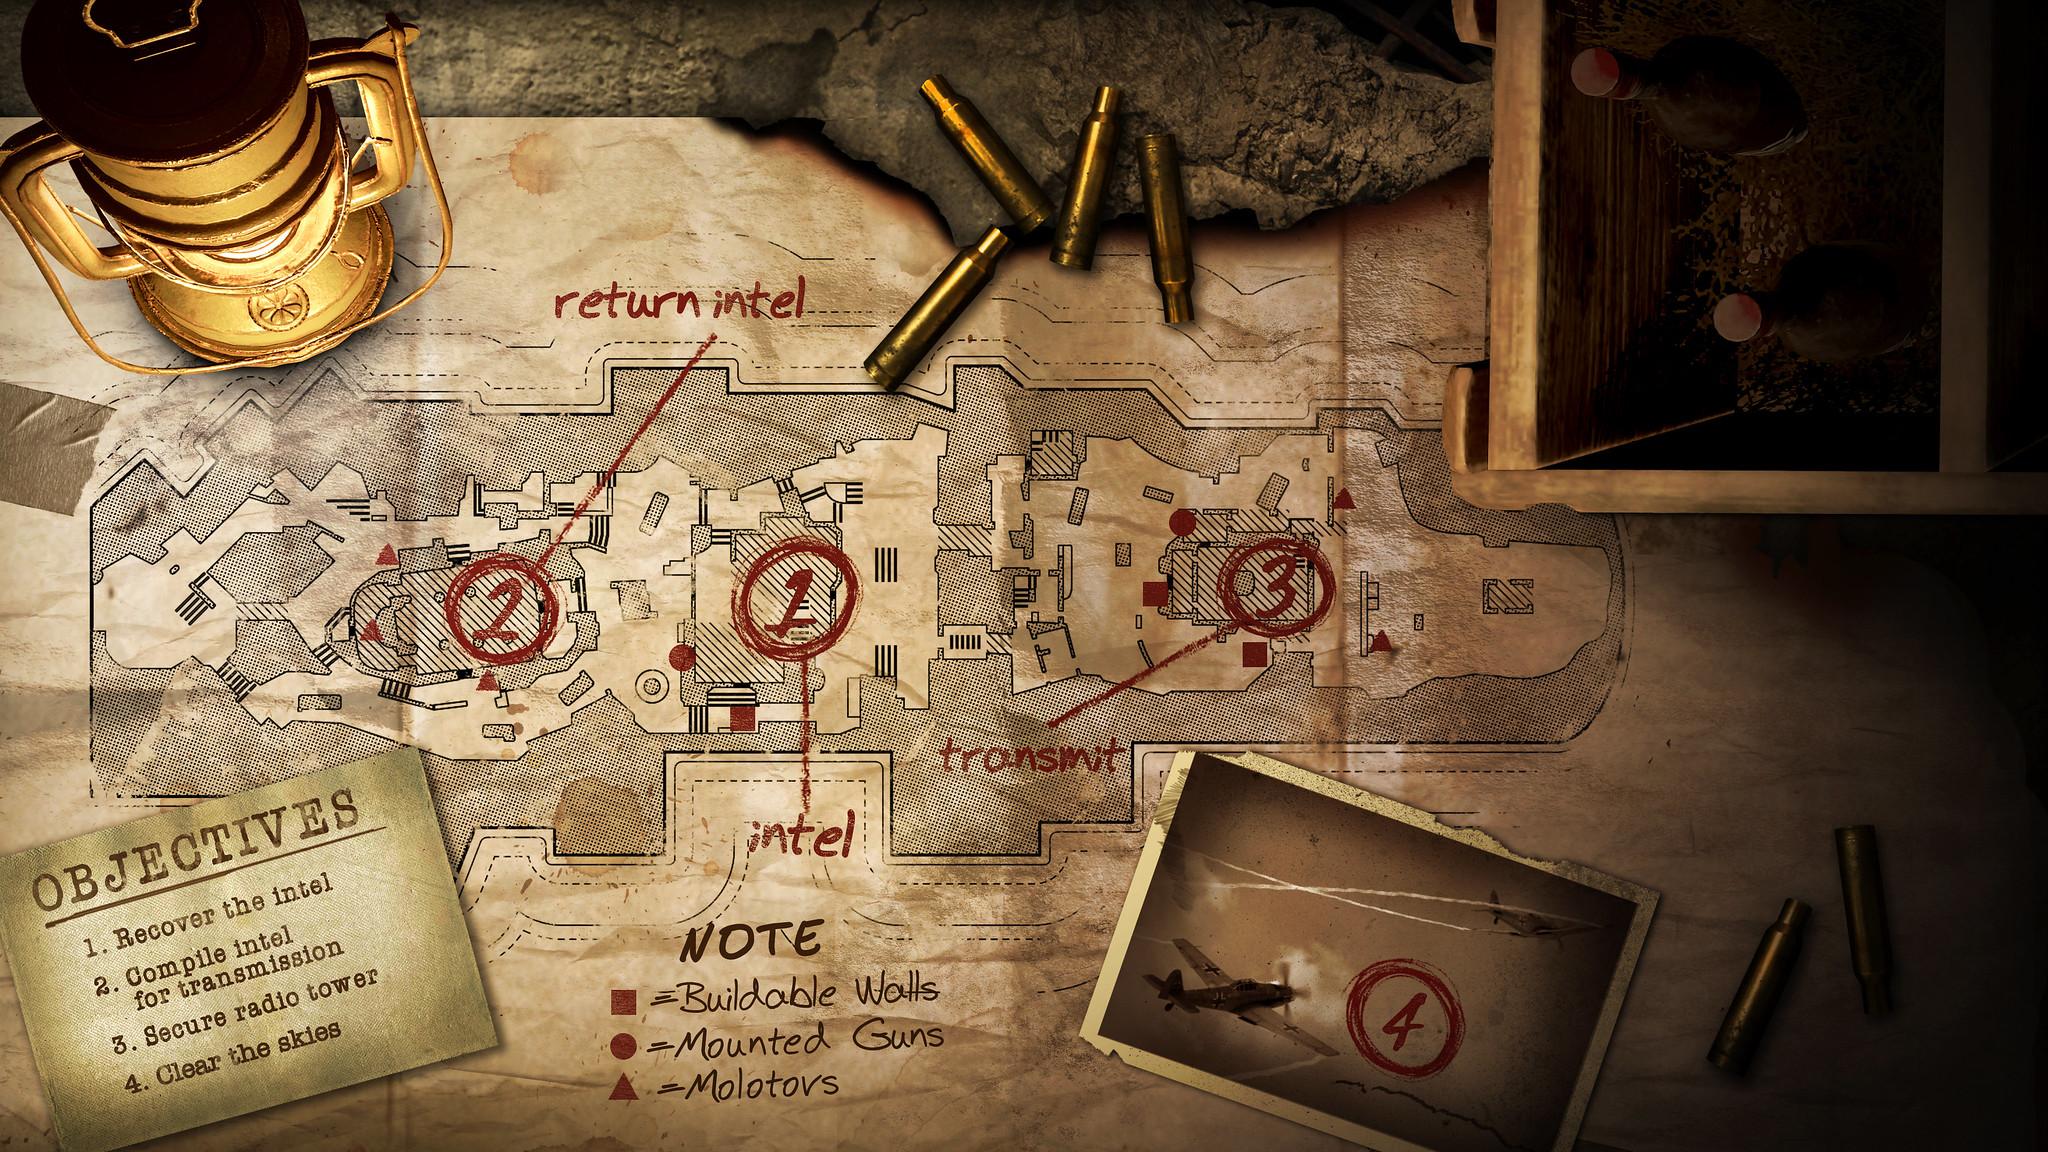 Call of Duty: WWII – Operation Husky